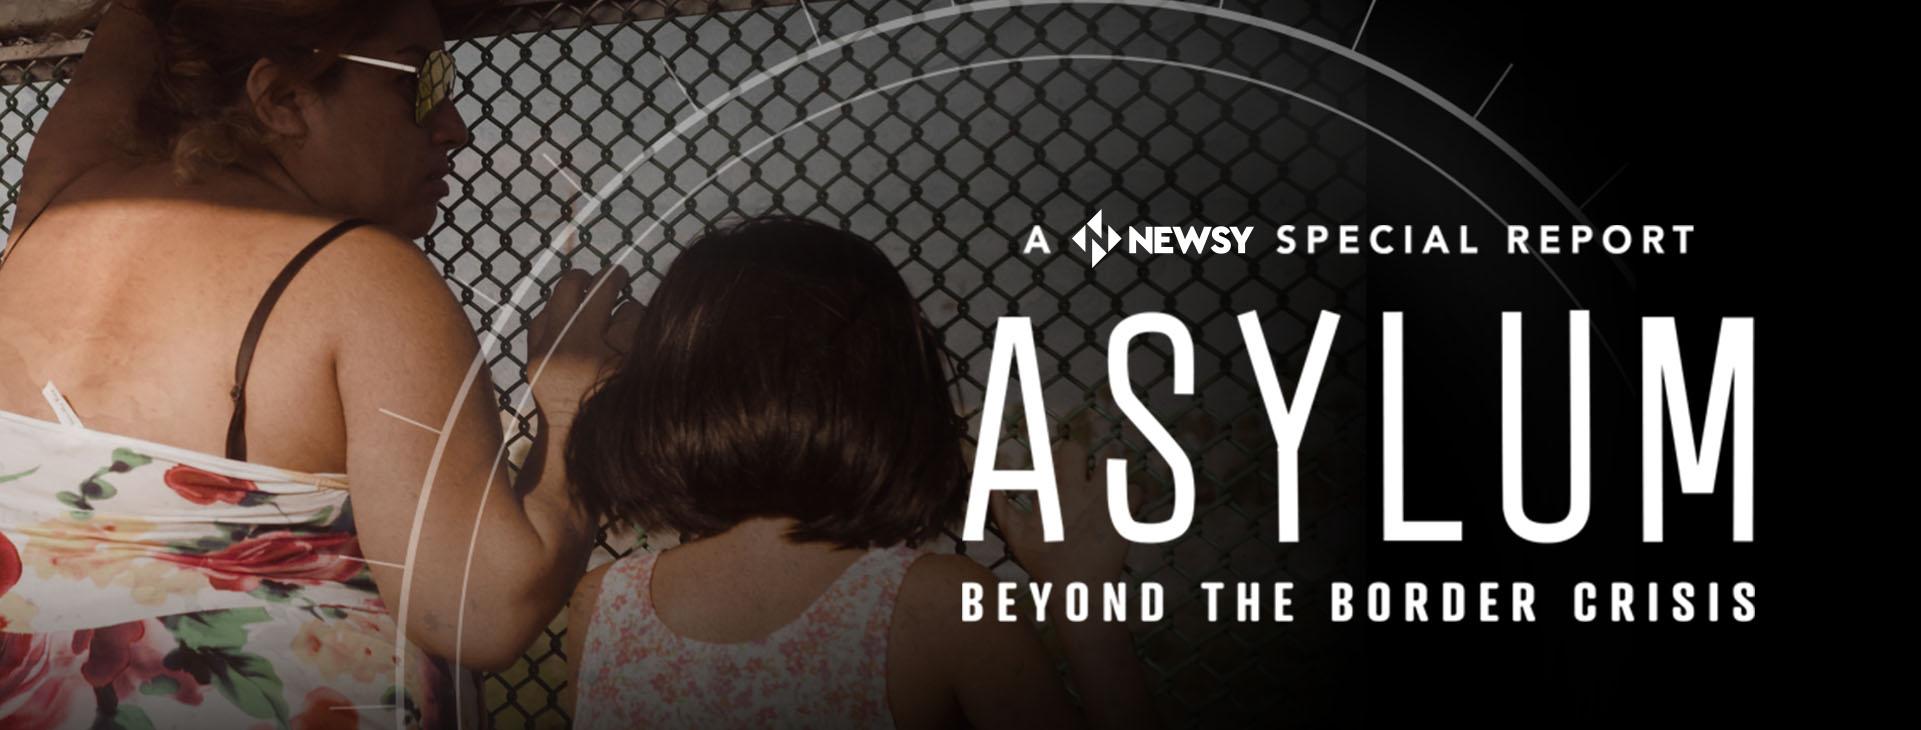 Asylum: Beyond the Border Crisis